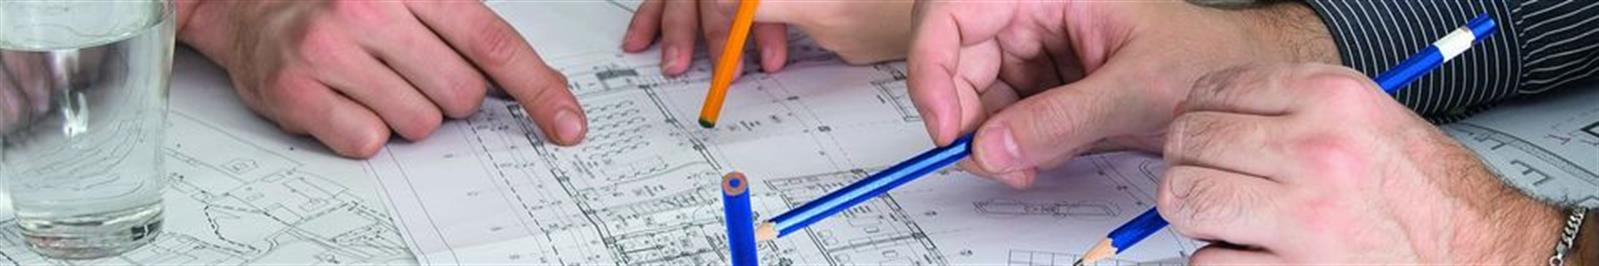 https://assets.master-builders-solutions.com/fr-fr/crayon_basf_architecte.jpg?width=1599